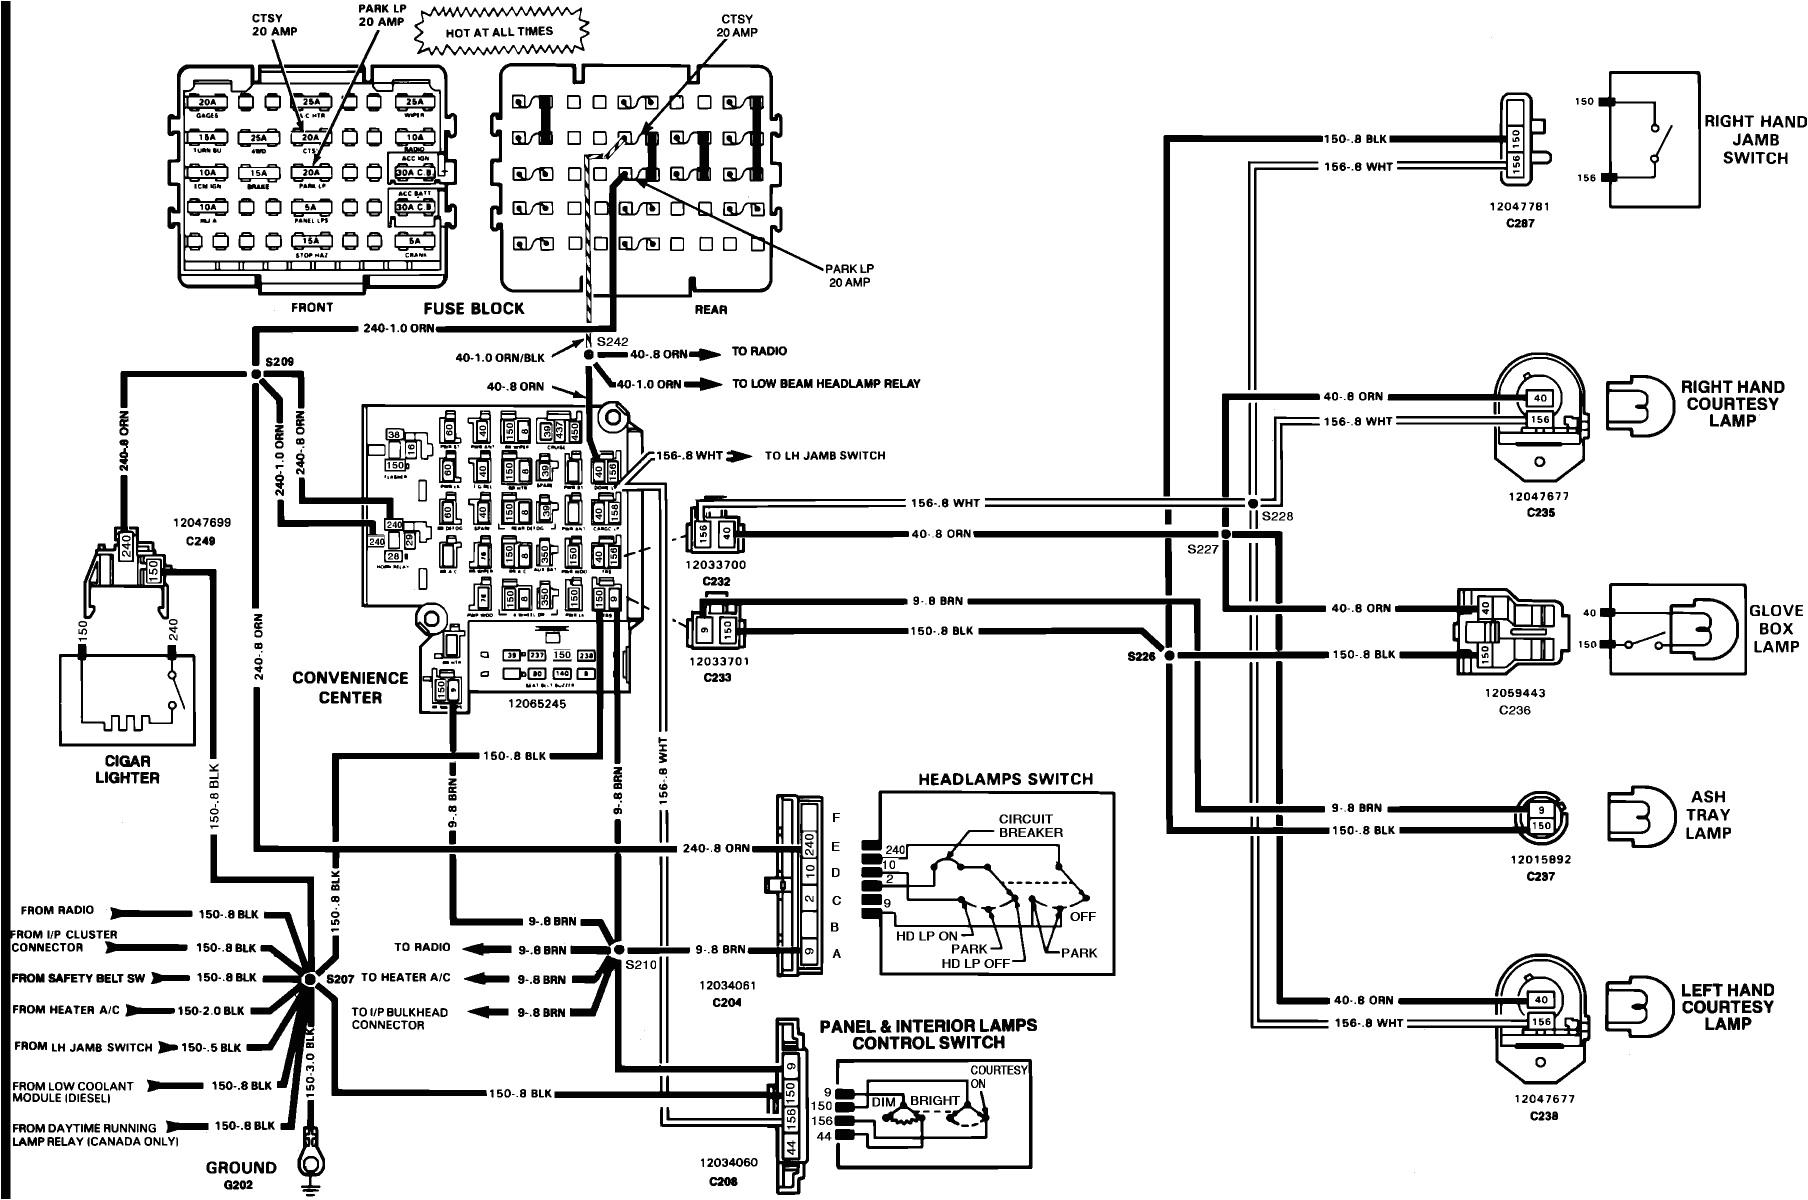 wiring diagram for 1995 chevy g30 van wiring diagram database 95 g30 wiring diagram